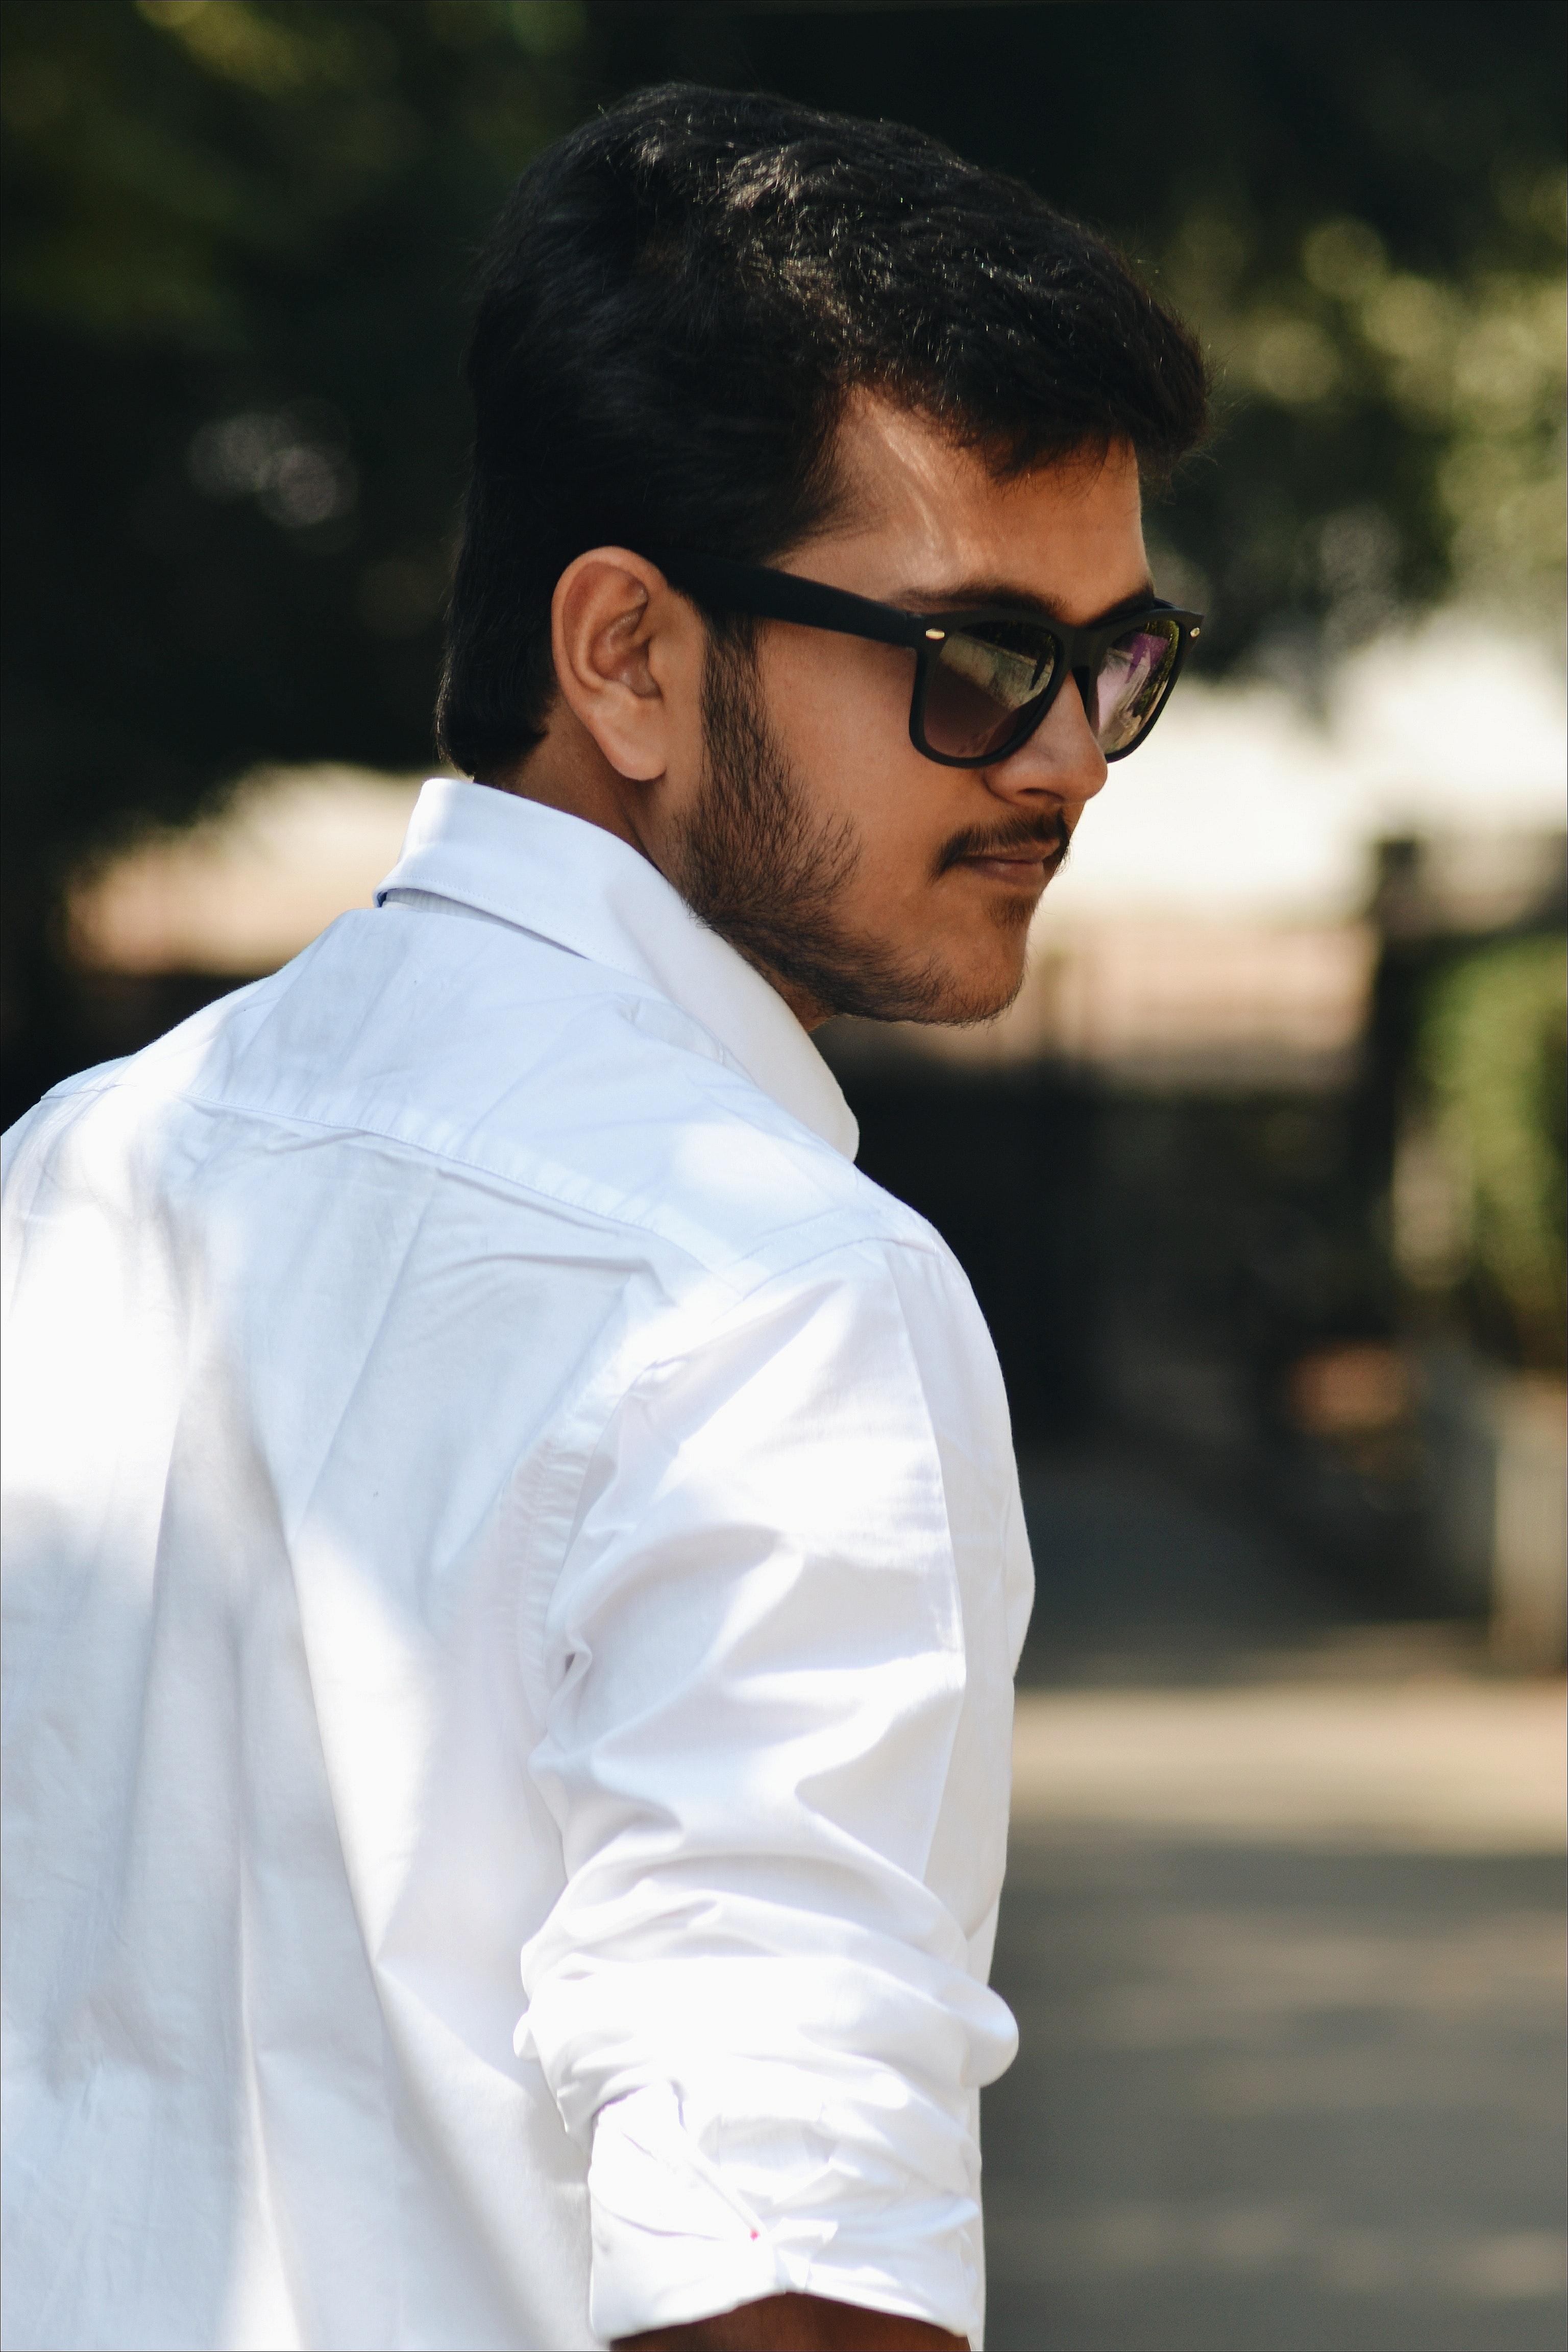 Mens White Button-Up Dress Shirt  Free Stock Photo-5981